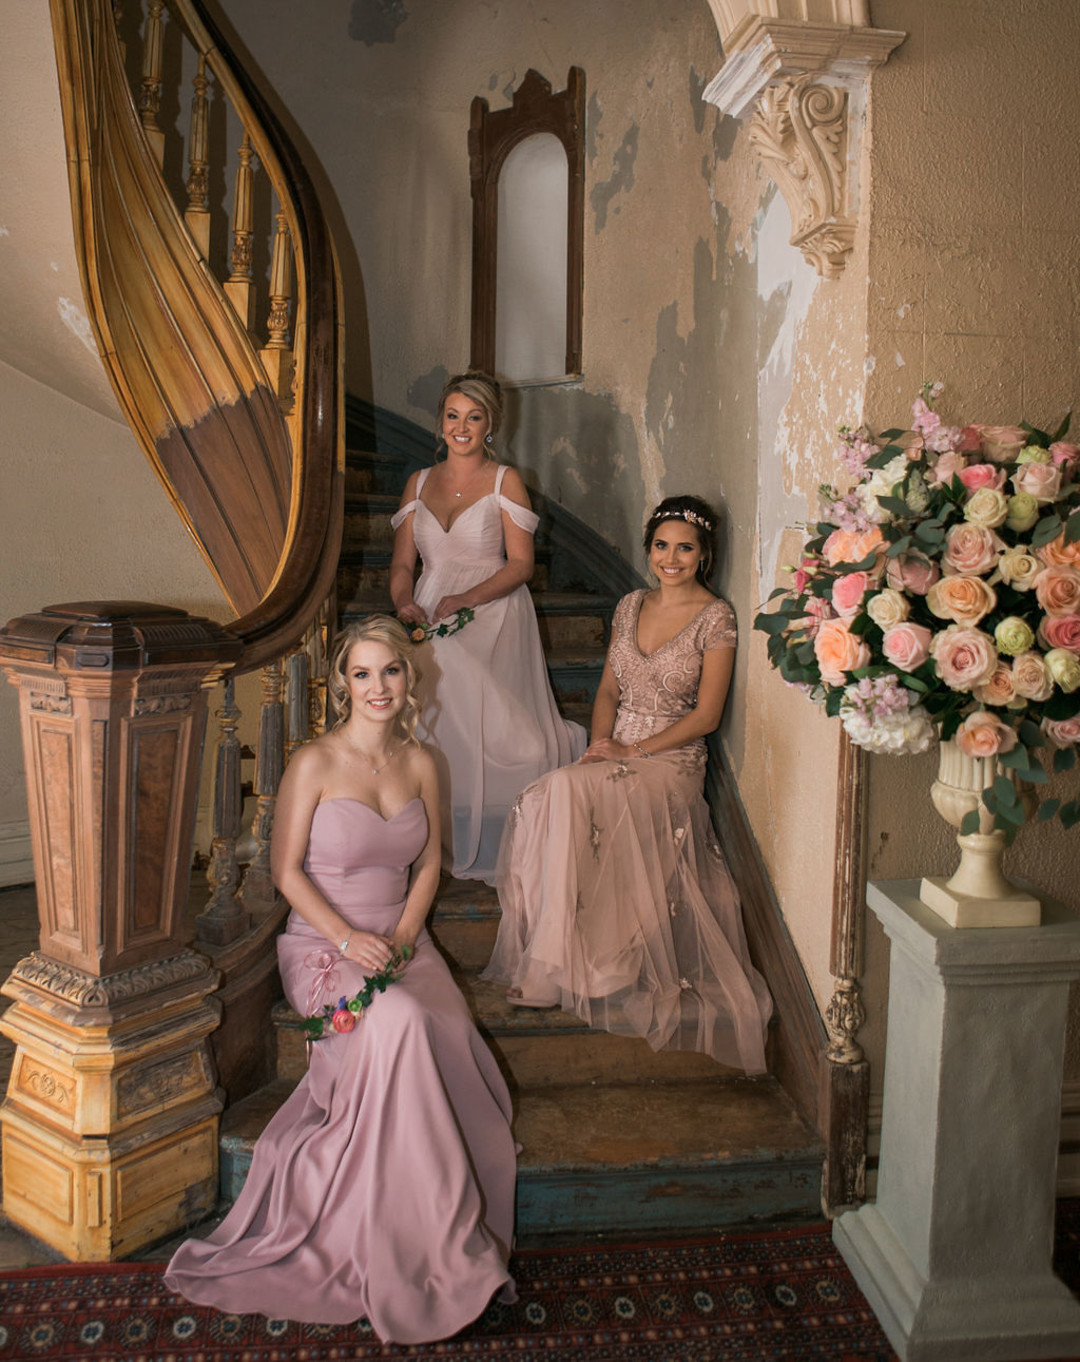 Boho bridal fashion: Bohemian wedding inspiration captured by Truly Sublime Photography. See more boho wedding ideas on CHItheeWED.com!